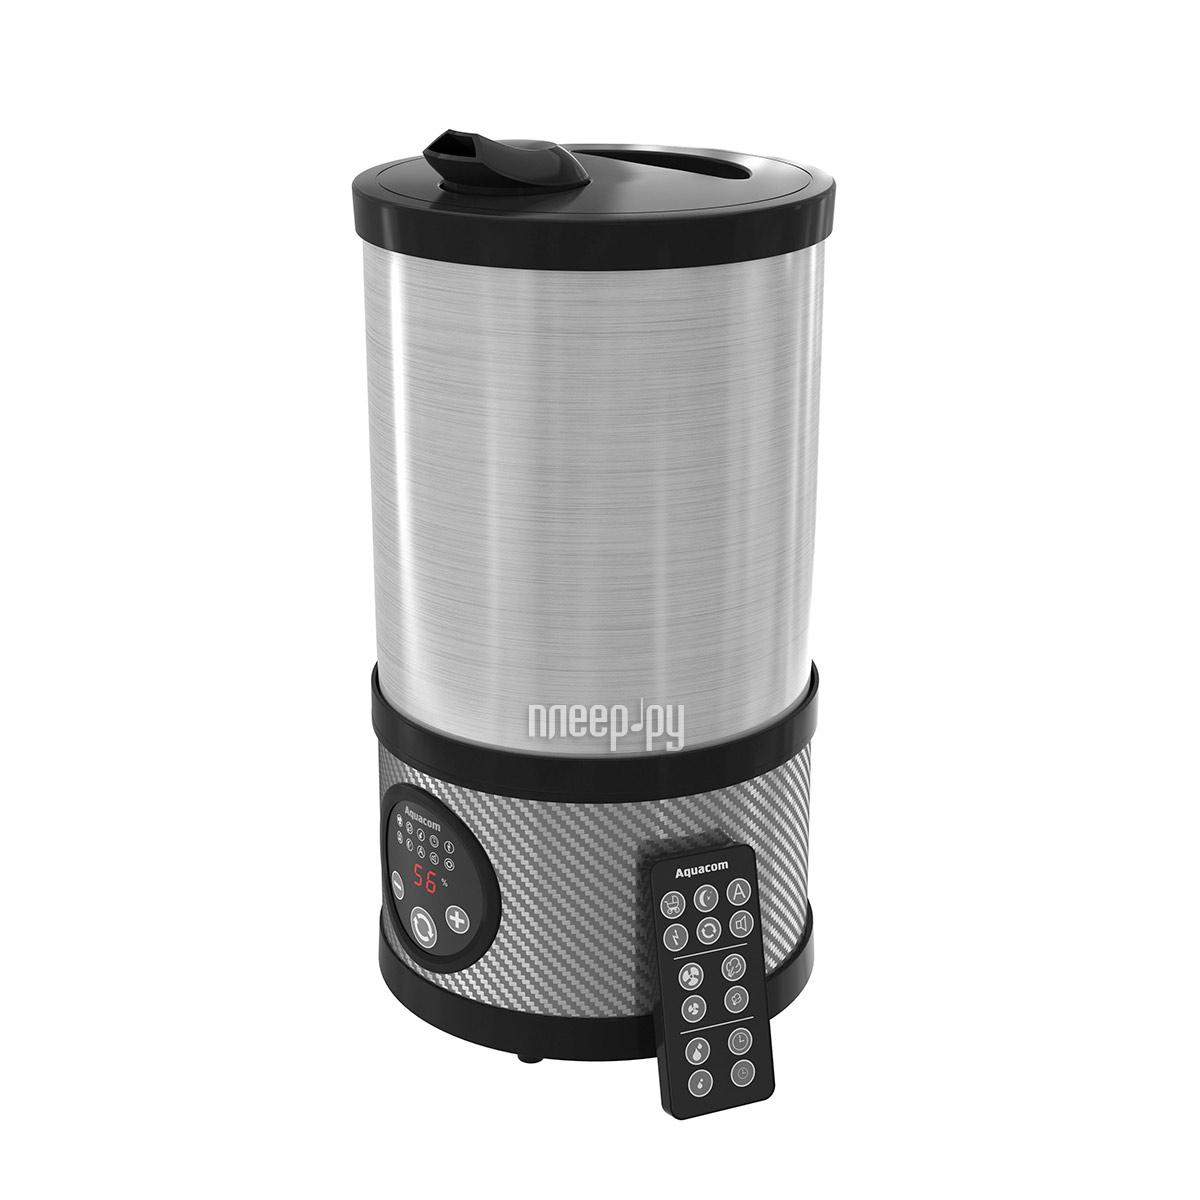 Aquacom MX2-850 Black-Silver Rugged